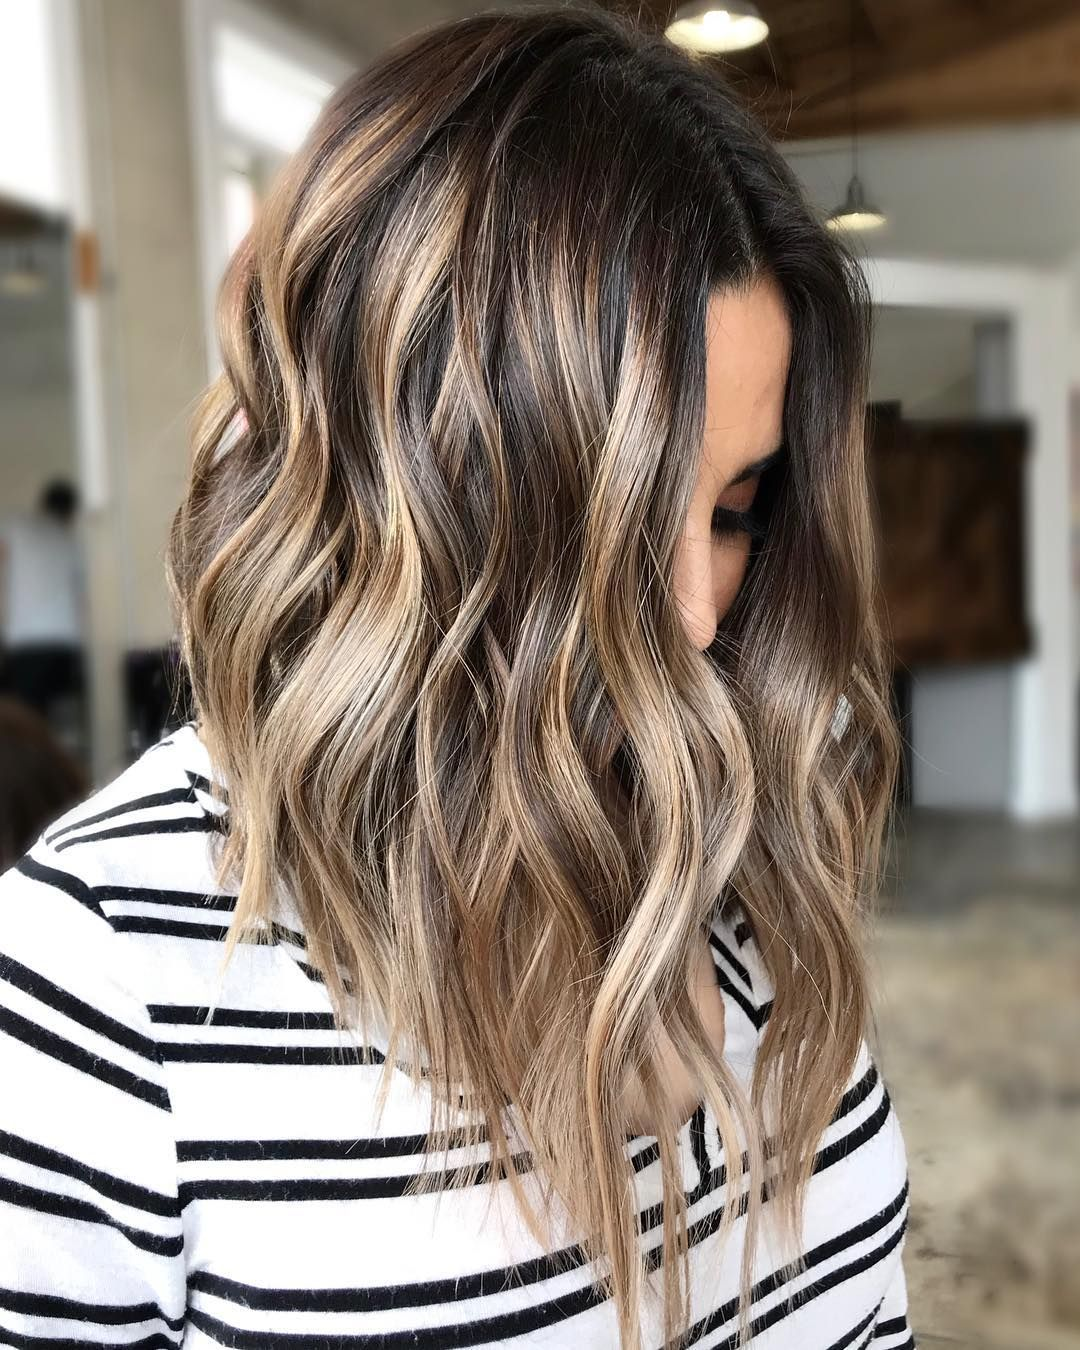 Flattering Shoulder Length Wavy Hairstyles For Women Female Medium Haircuts Hair Styles Balayage Hair Medium Hair Styles